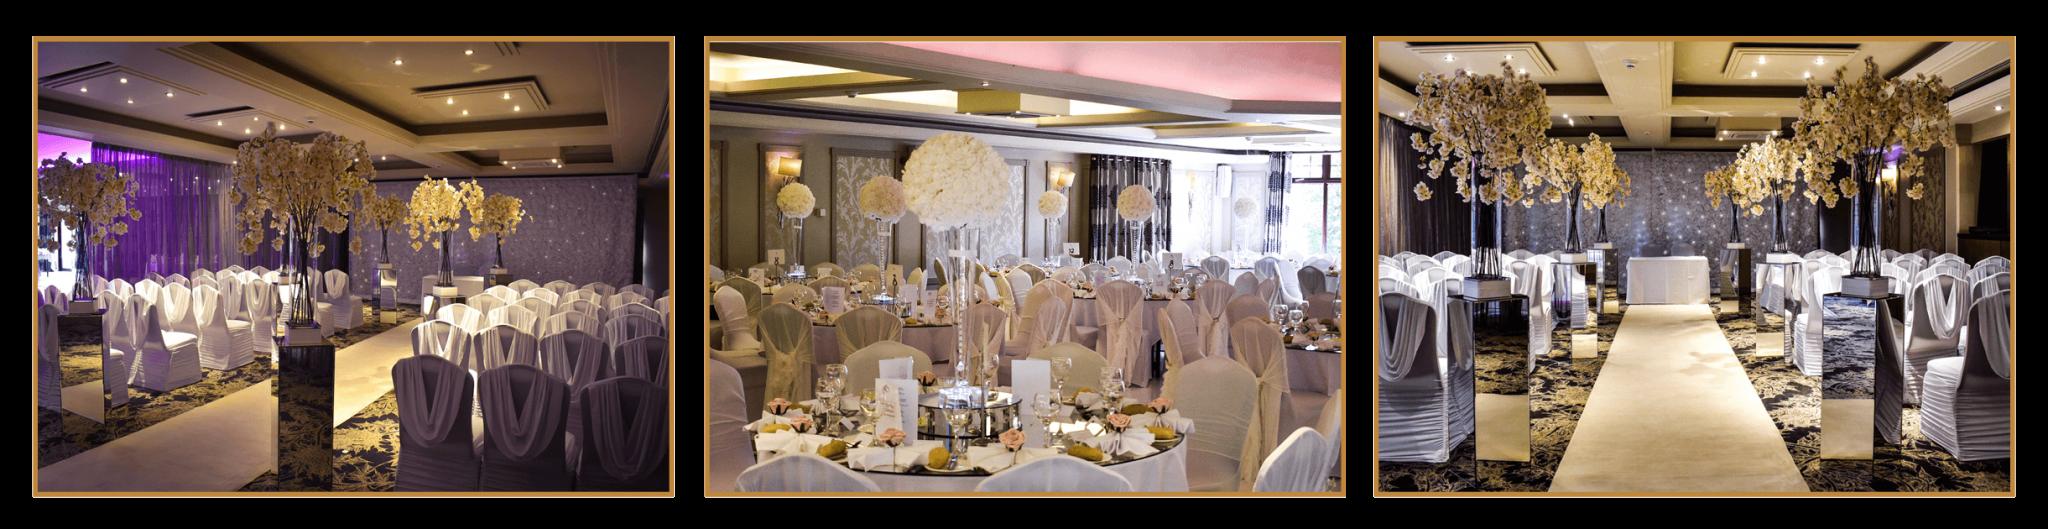 Dalziel Park Hotel Lanarkshire Wedding